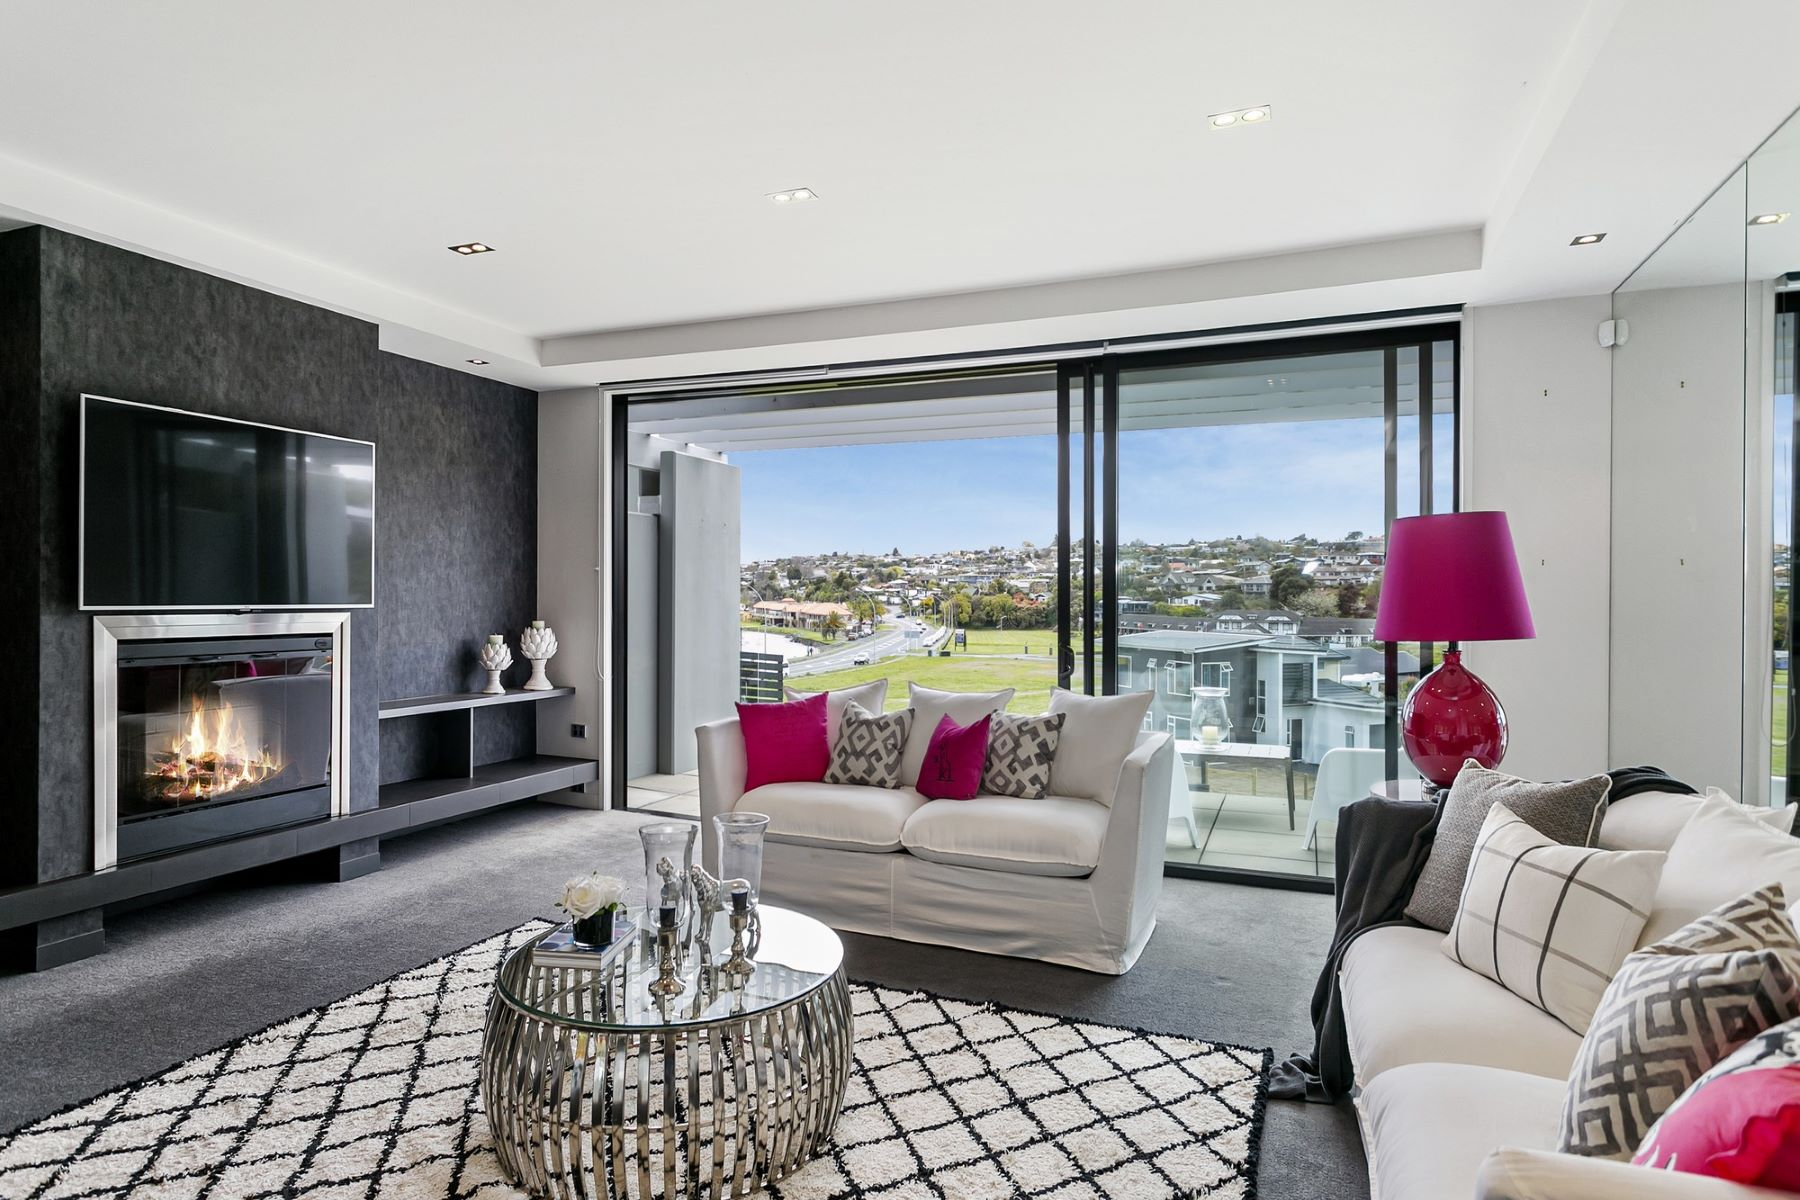 Apartments for Sale at Taupo, Waikato New Zealand